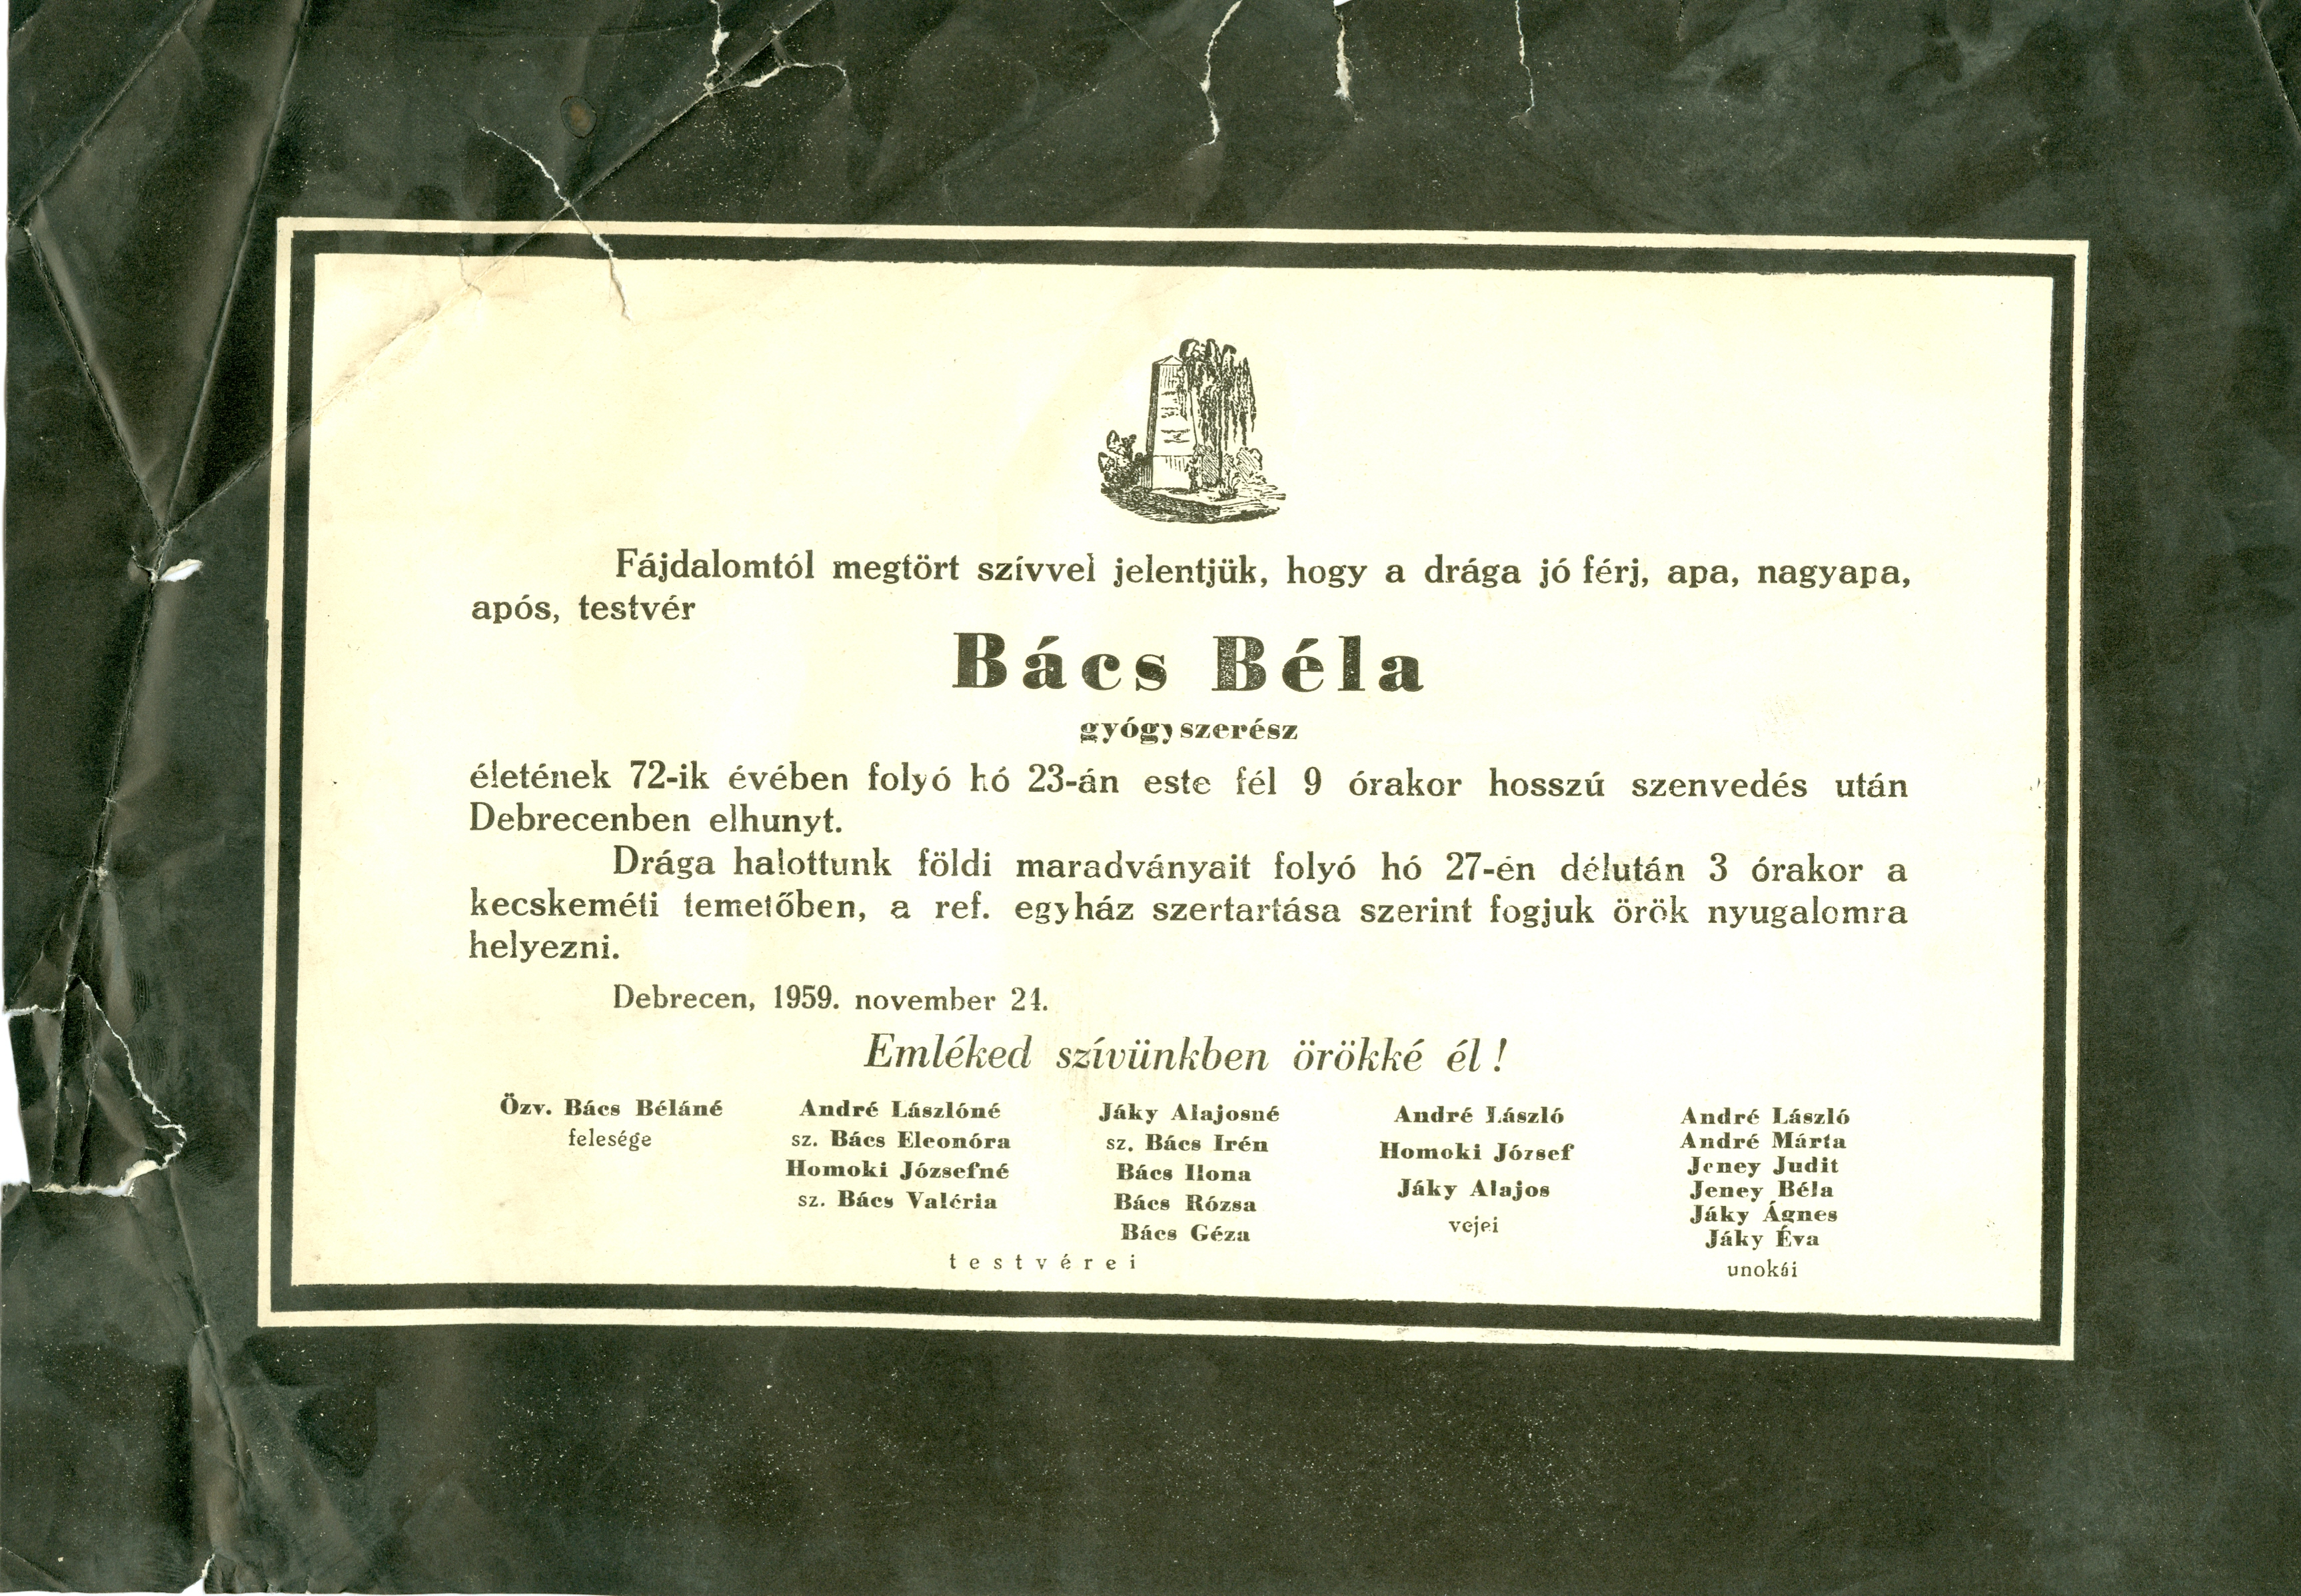 Bács Béla